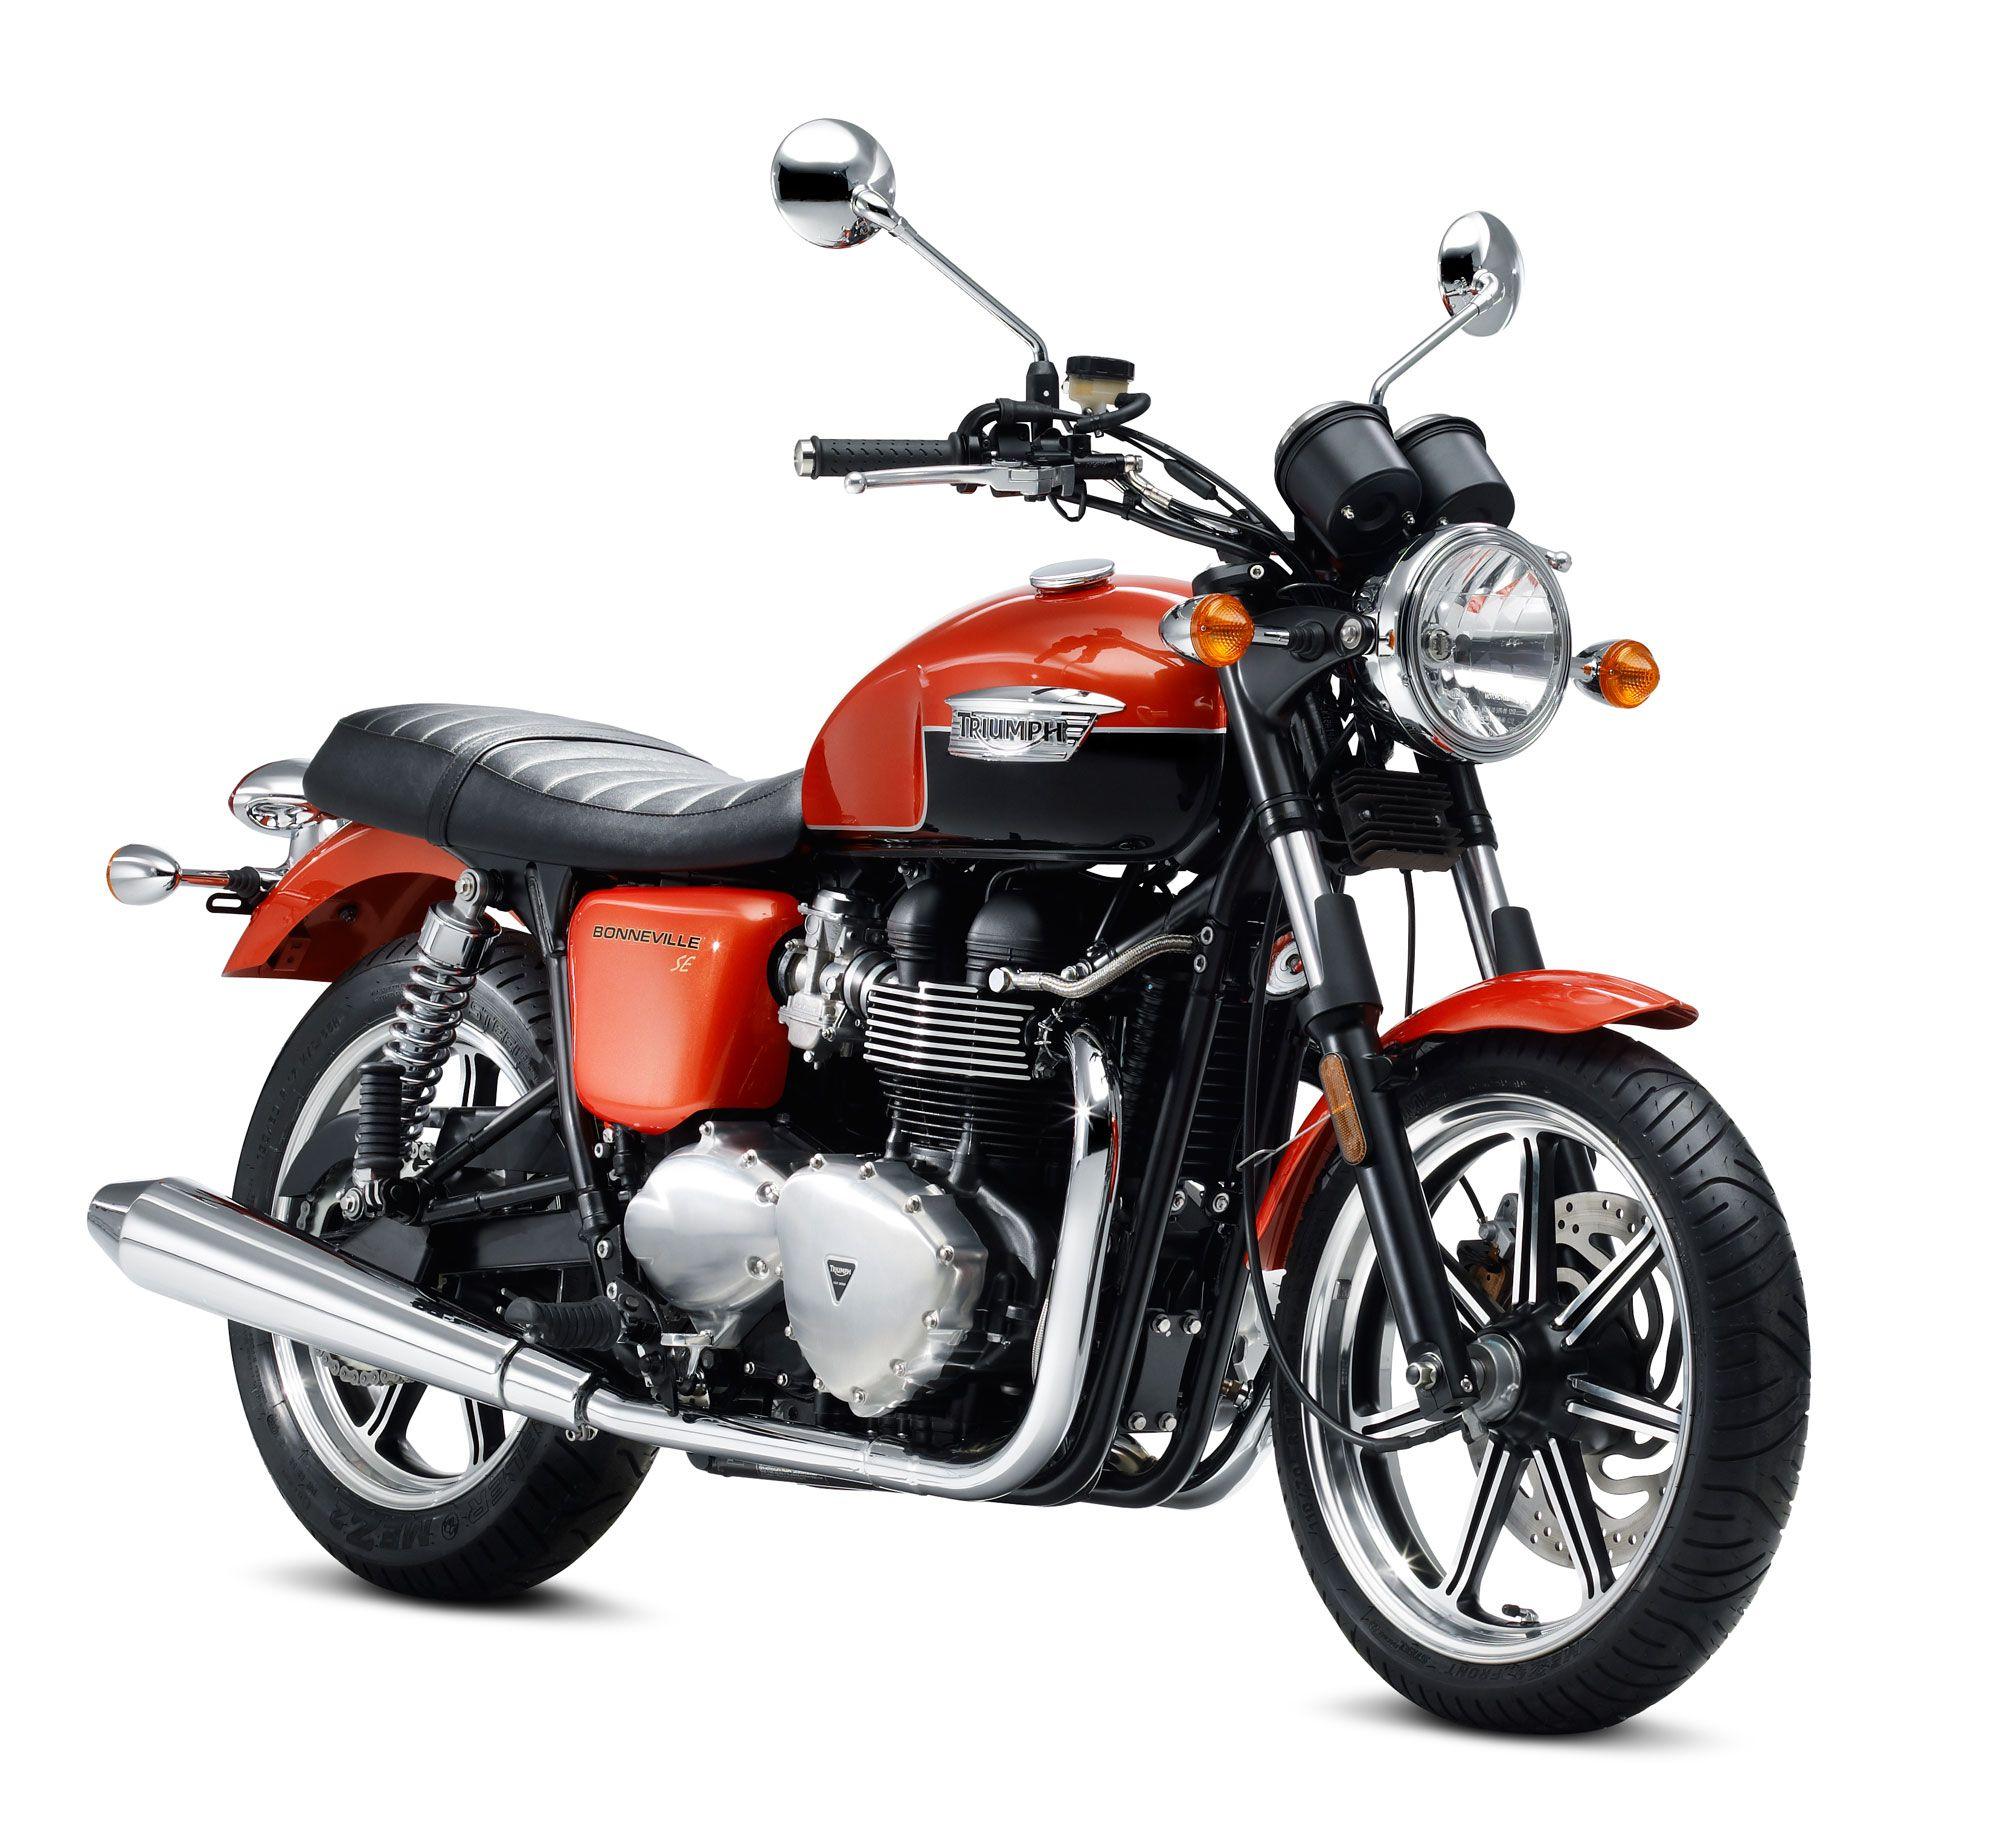 Triumph bonneville usa 1984 bikes motorbikes motorcycles motos motocicletas